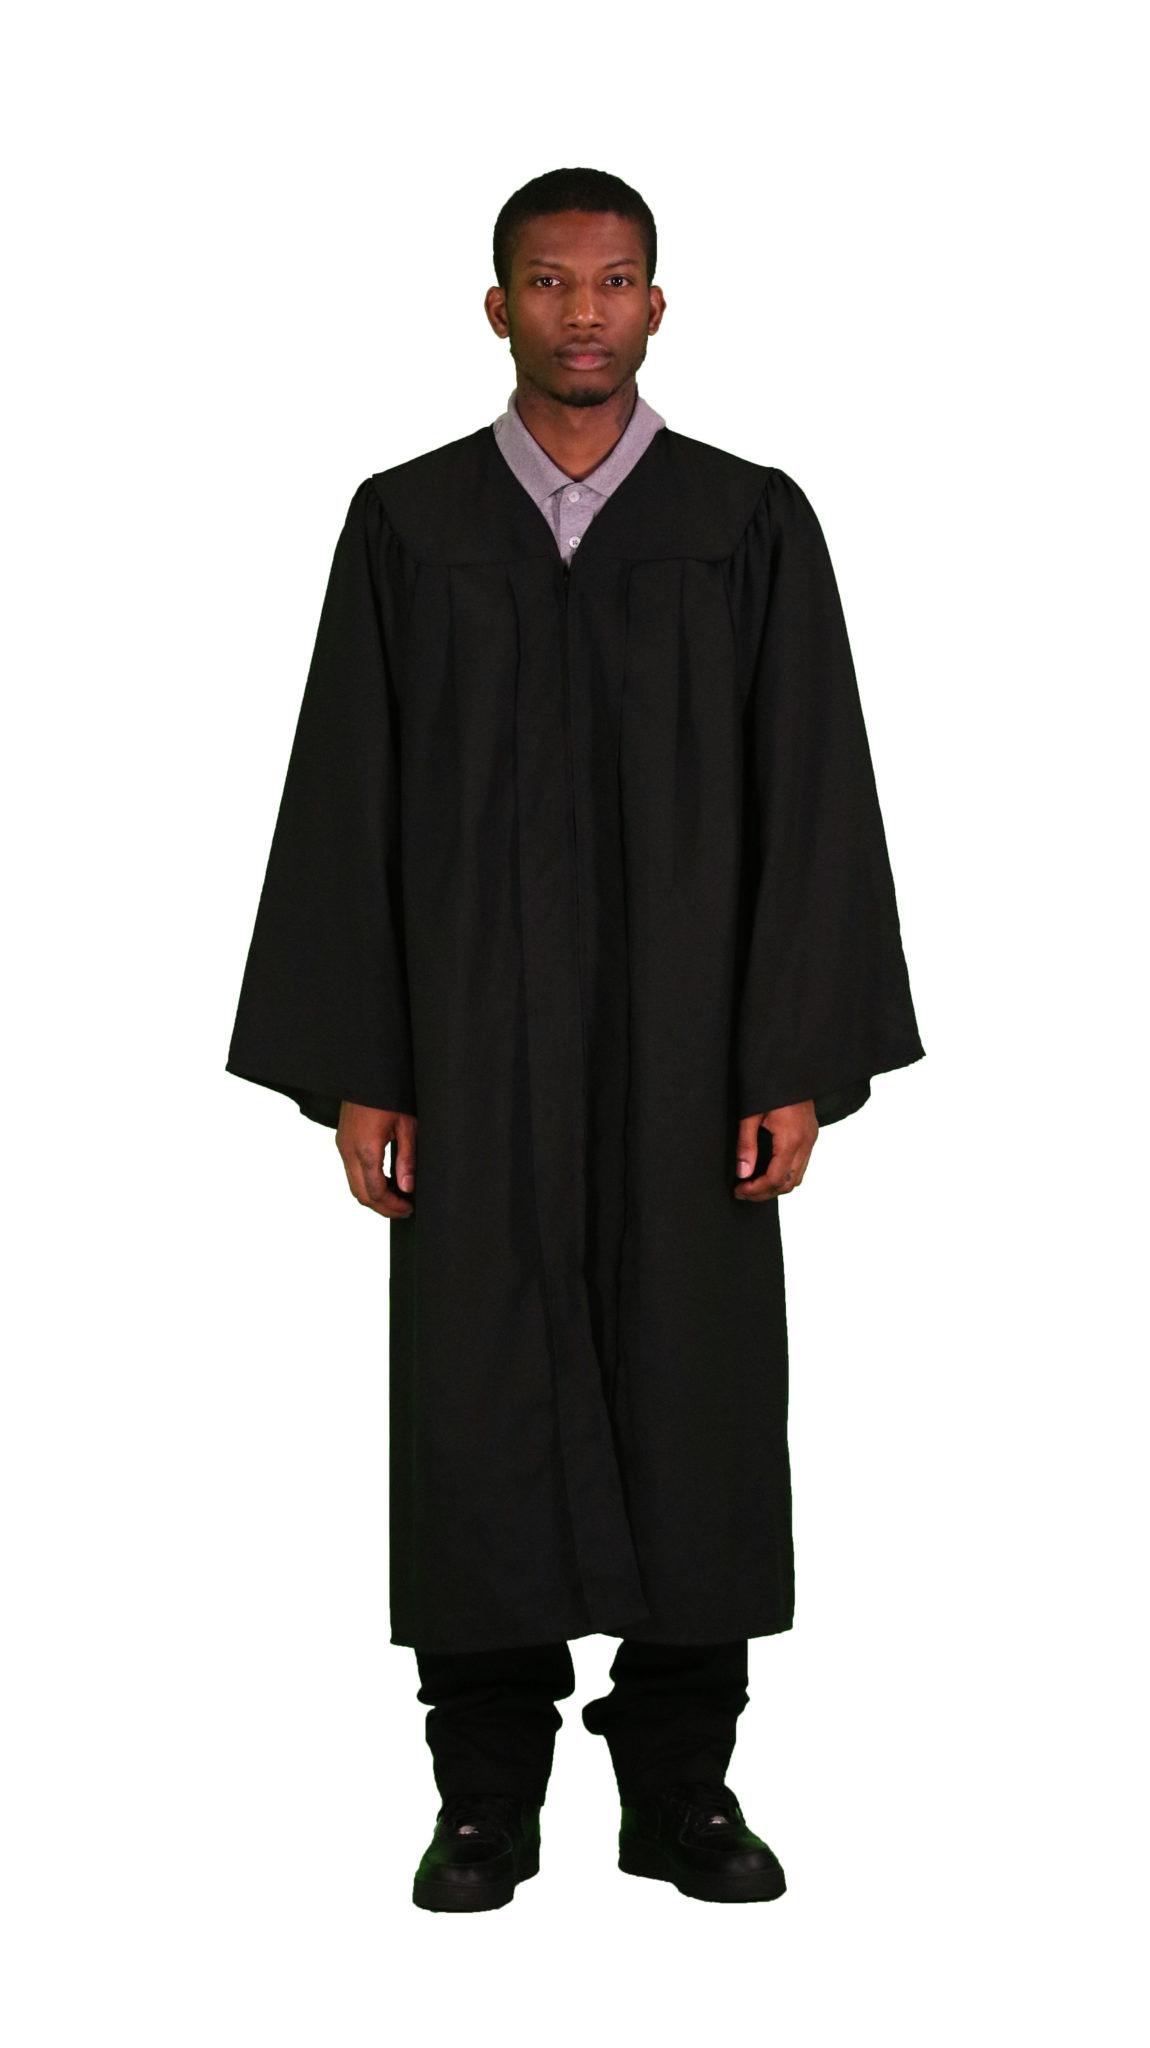 Graduation Costume Rentals